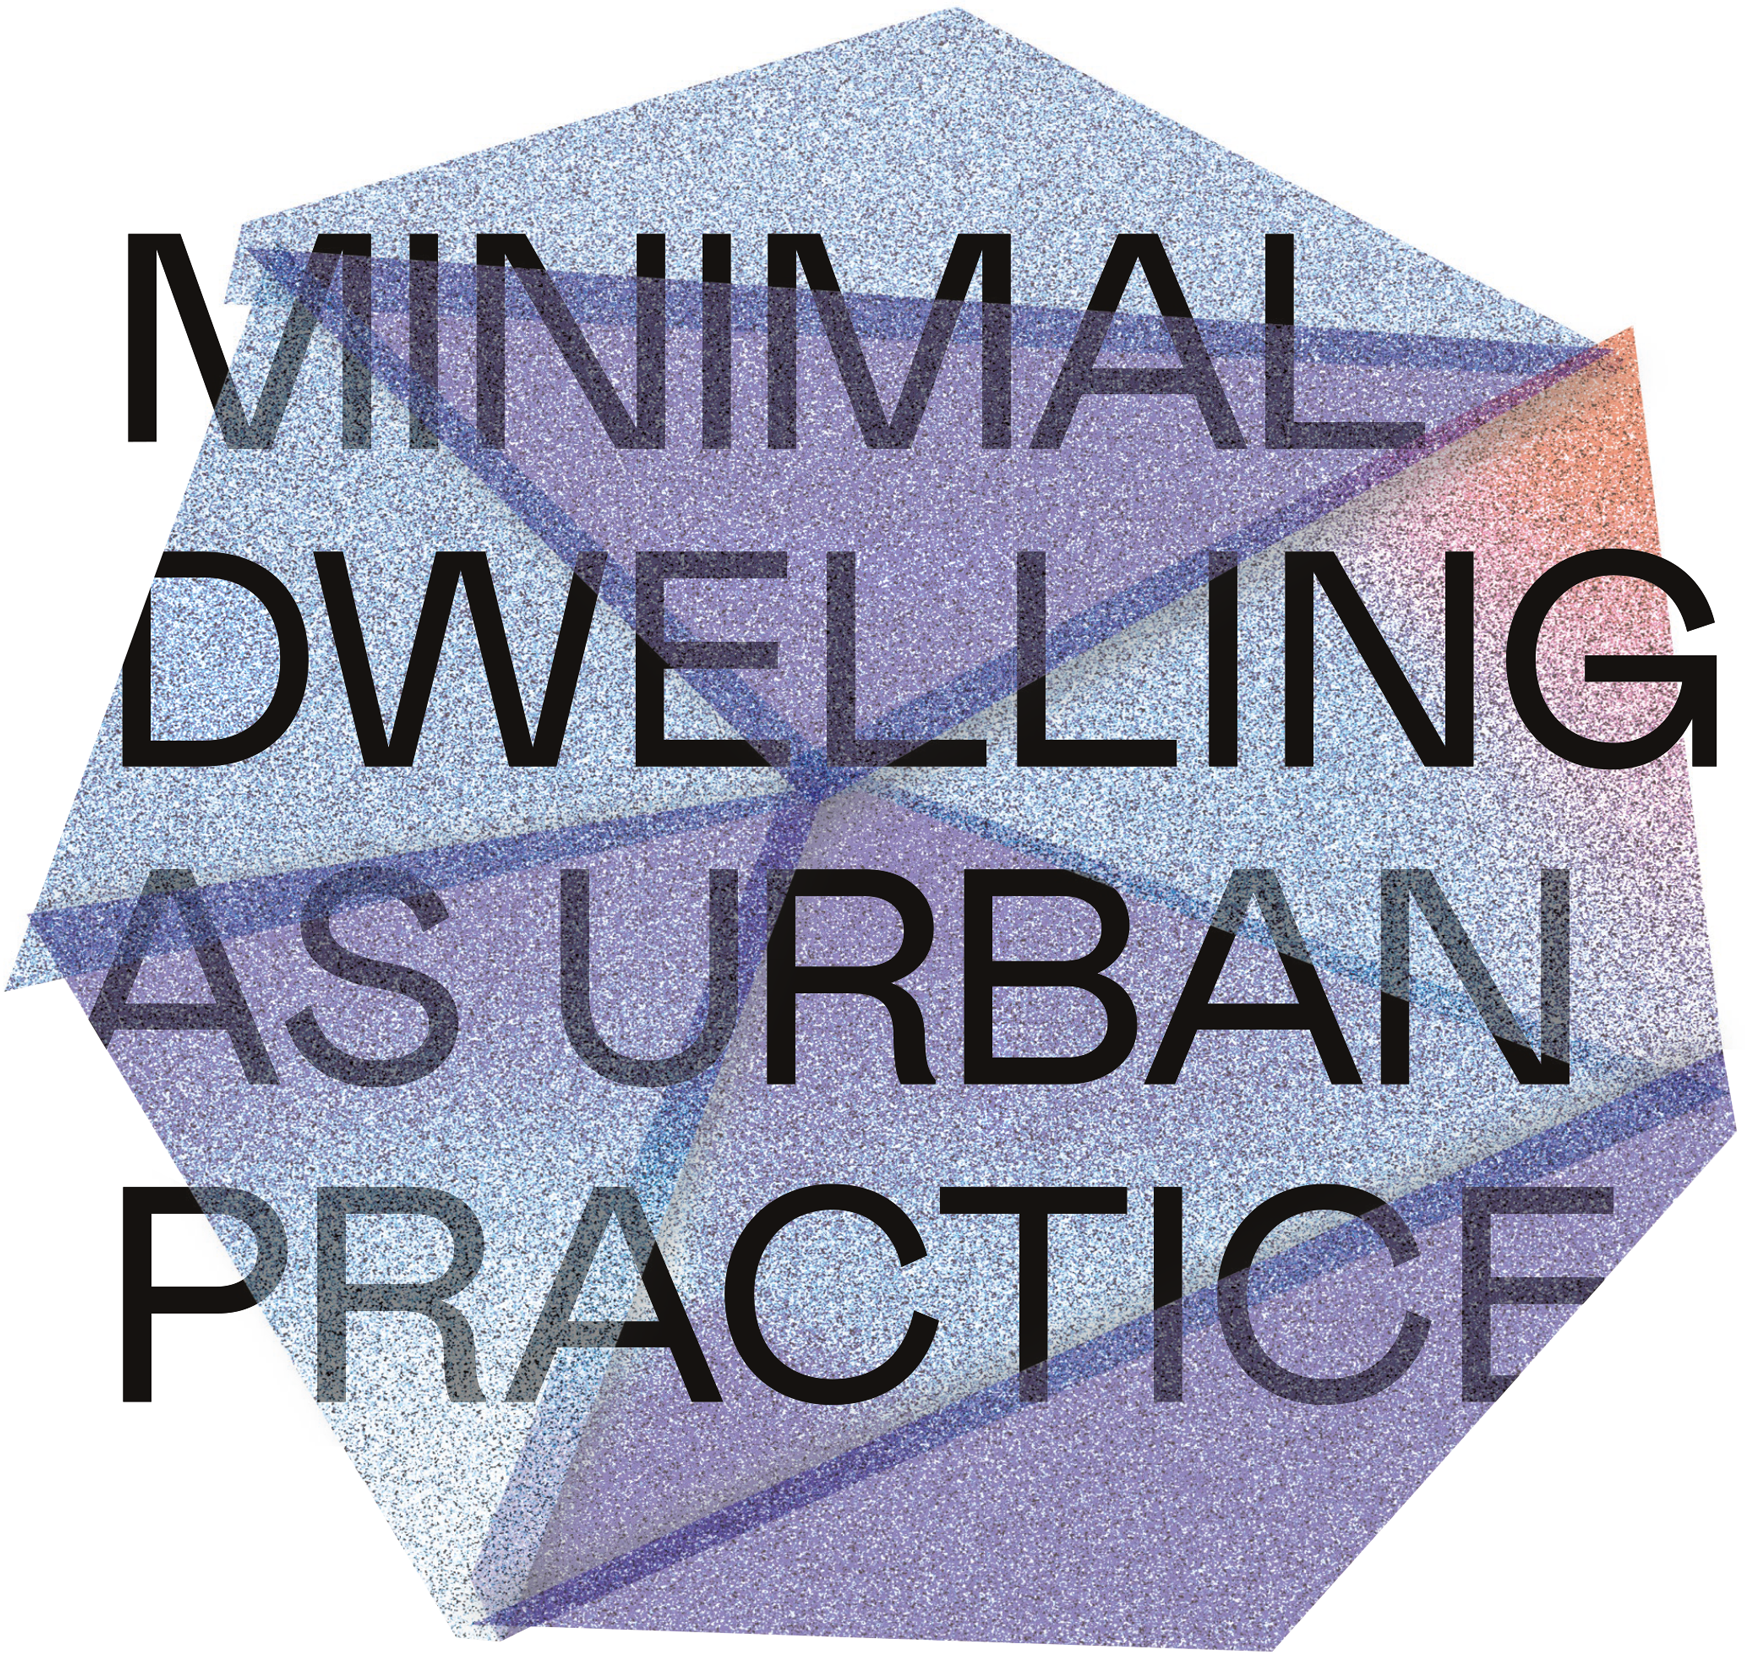 Minimal Dwelling as Urban Practice: IBA'27 School 2019